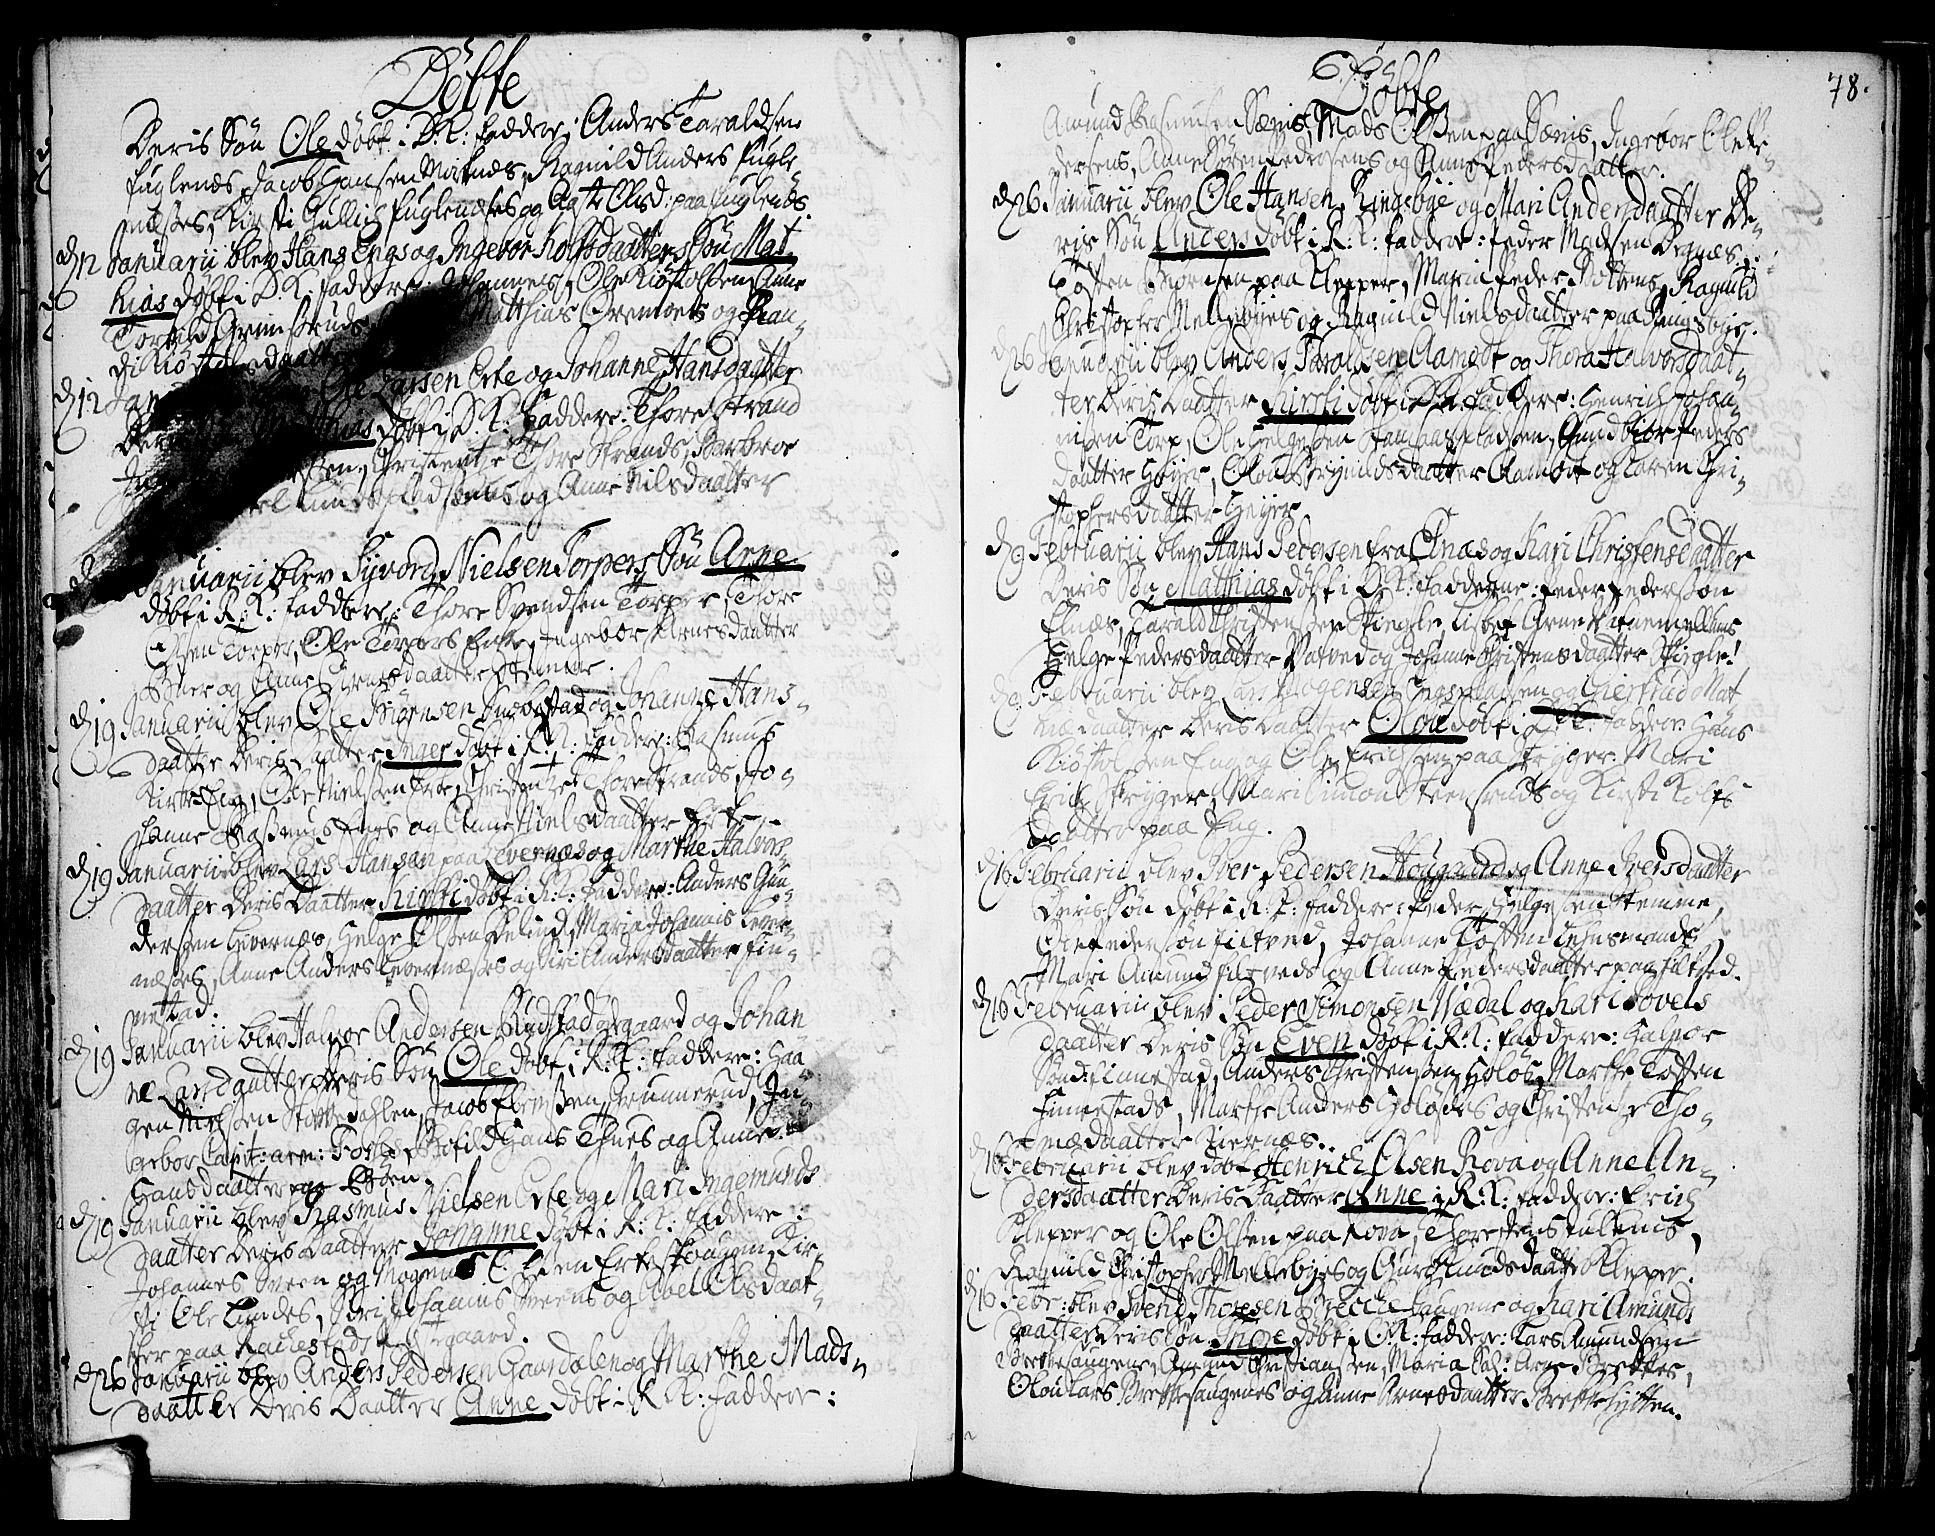 SAO, Rakkestad prestekontor Kirkebøker, F/Fa/L0002: Ministerialbok nr. I 2, 1741-1751, s. 78